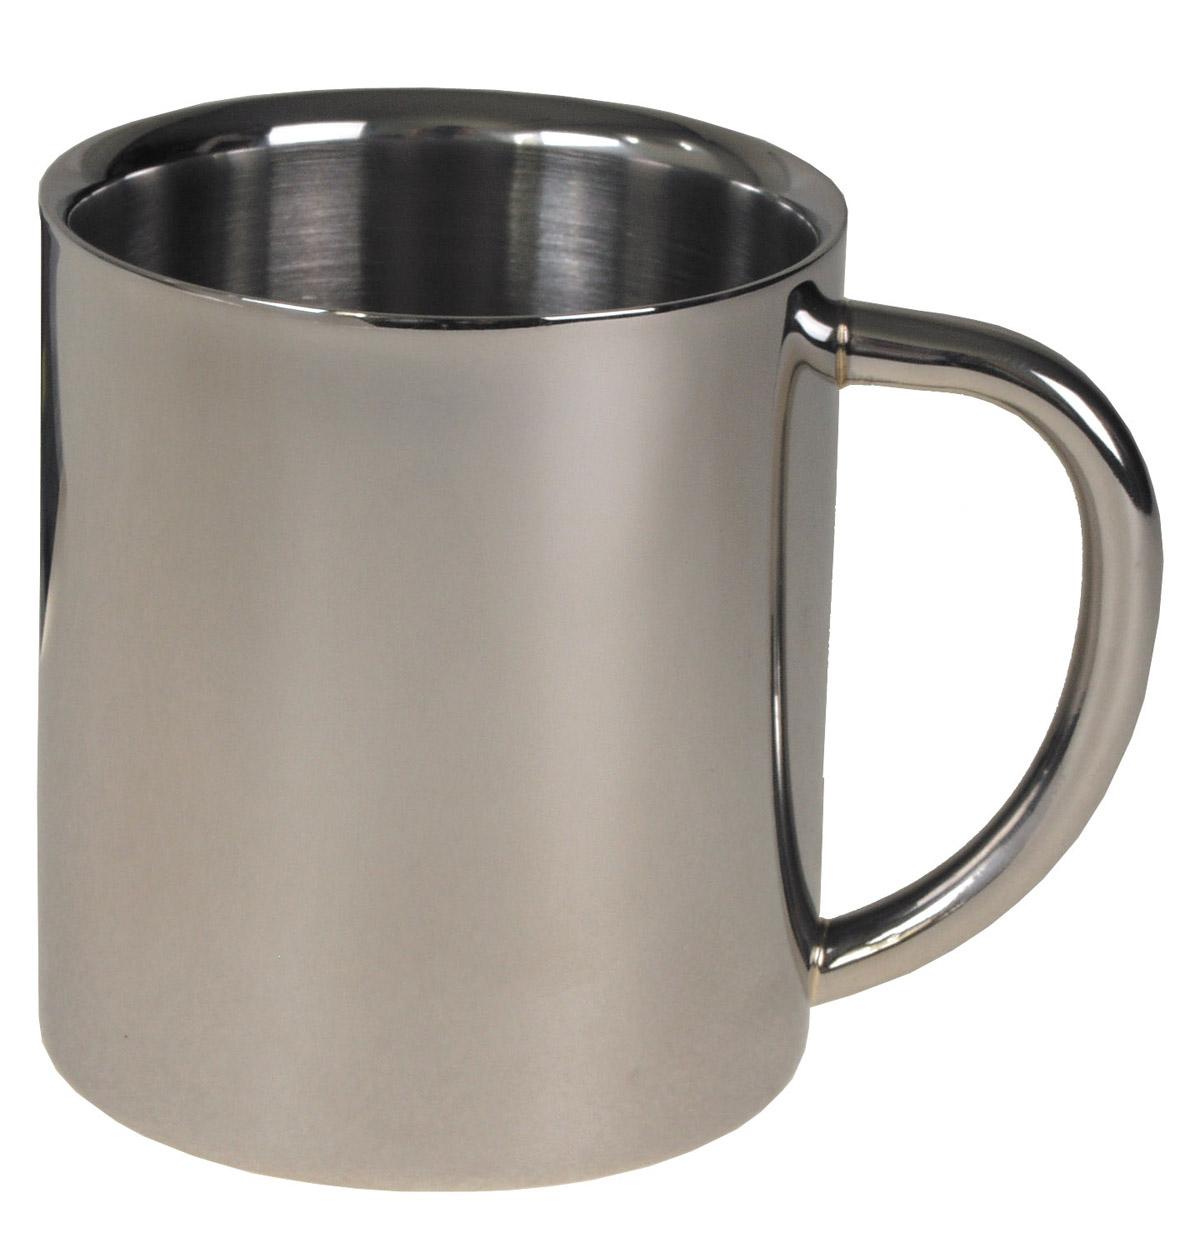 Tasse,  Edelstahl, doppelwandig,  ca. 250 ml